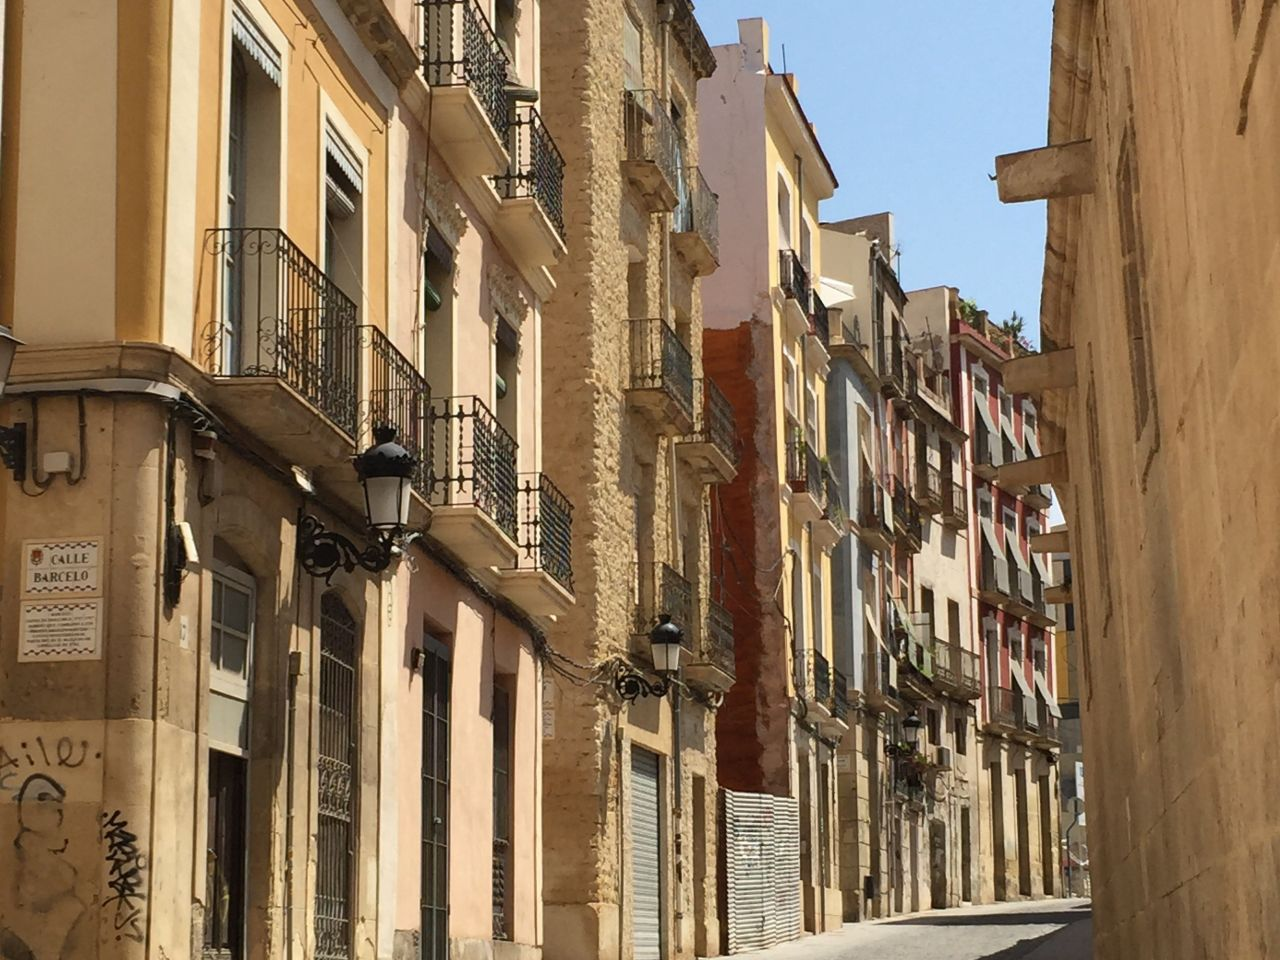 Alicante #whydontyou